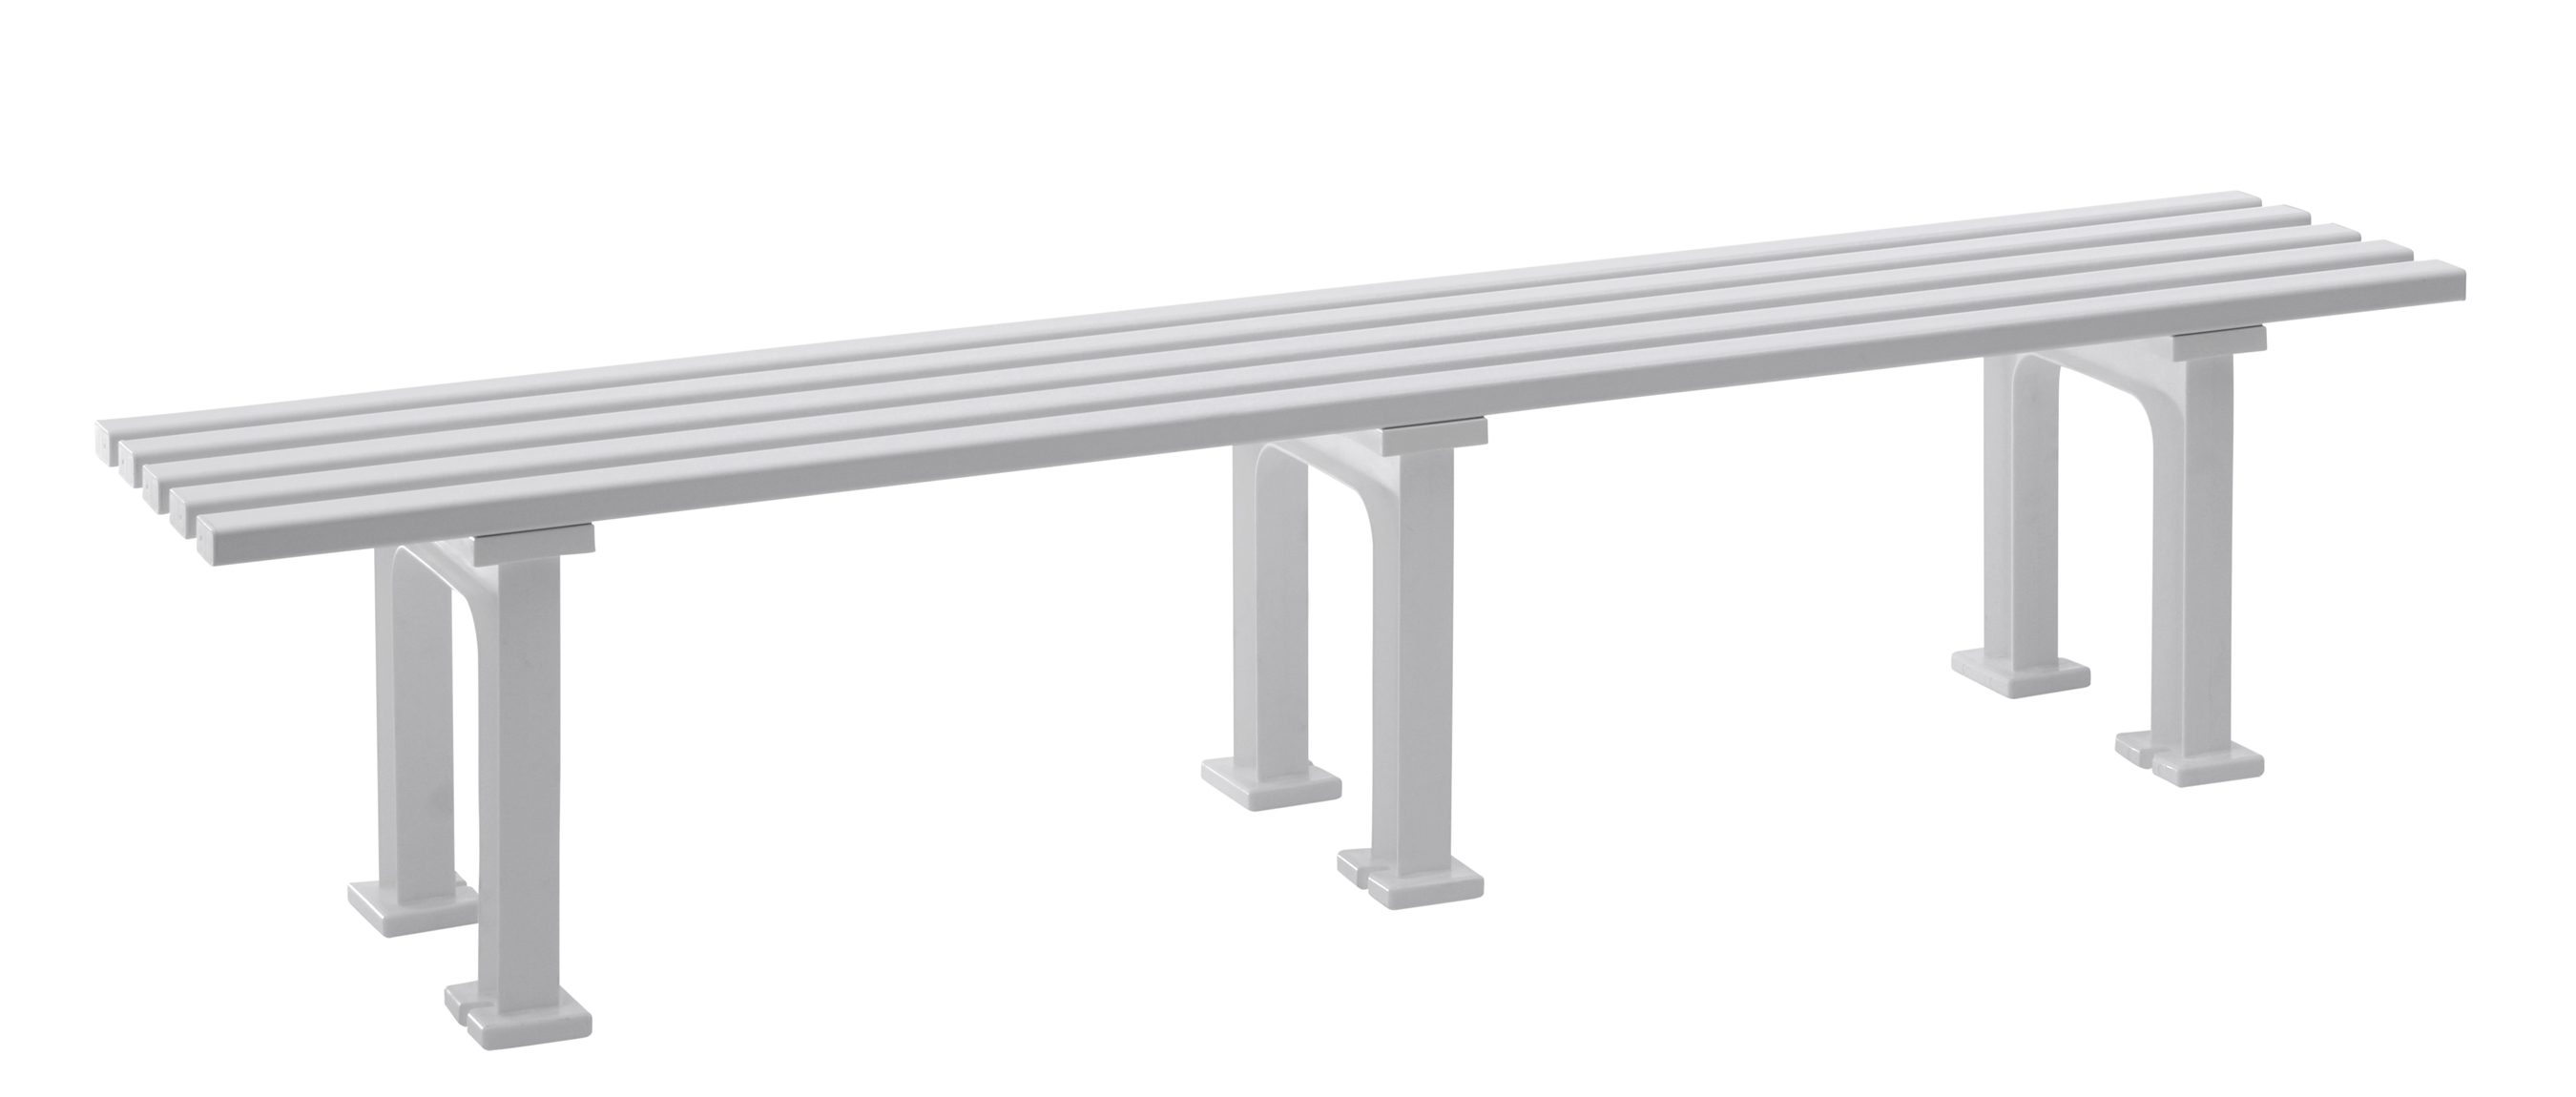 Blome Gartenbank / 4-Sitzer Bank Mono II Kunststoff weiß 200cm Bild 1